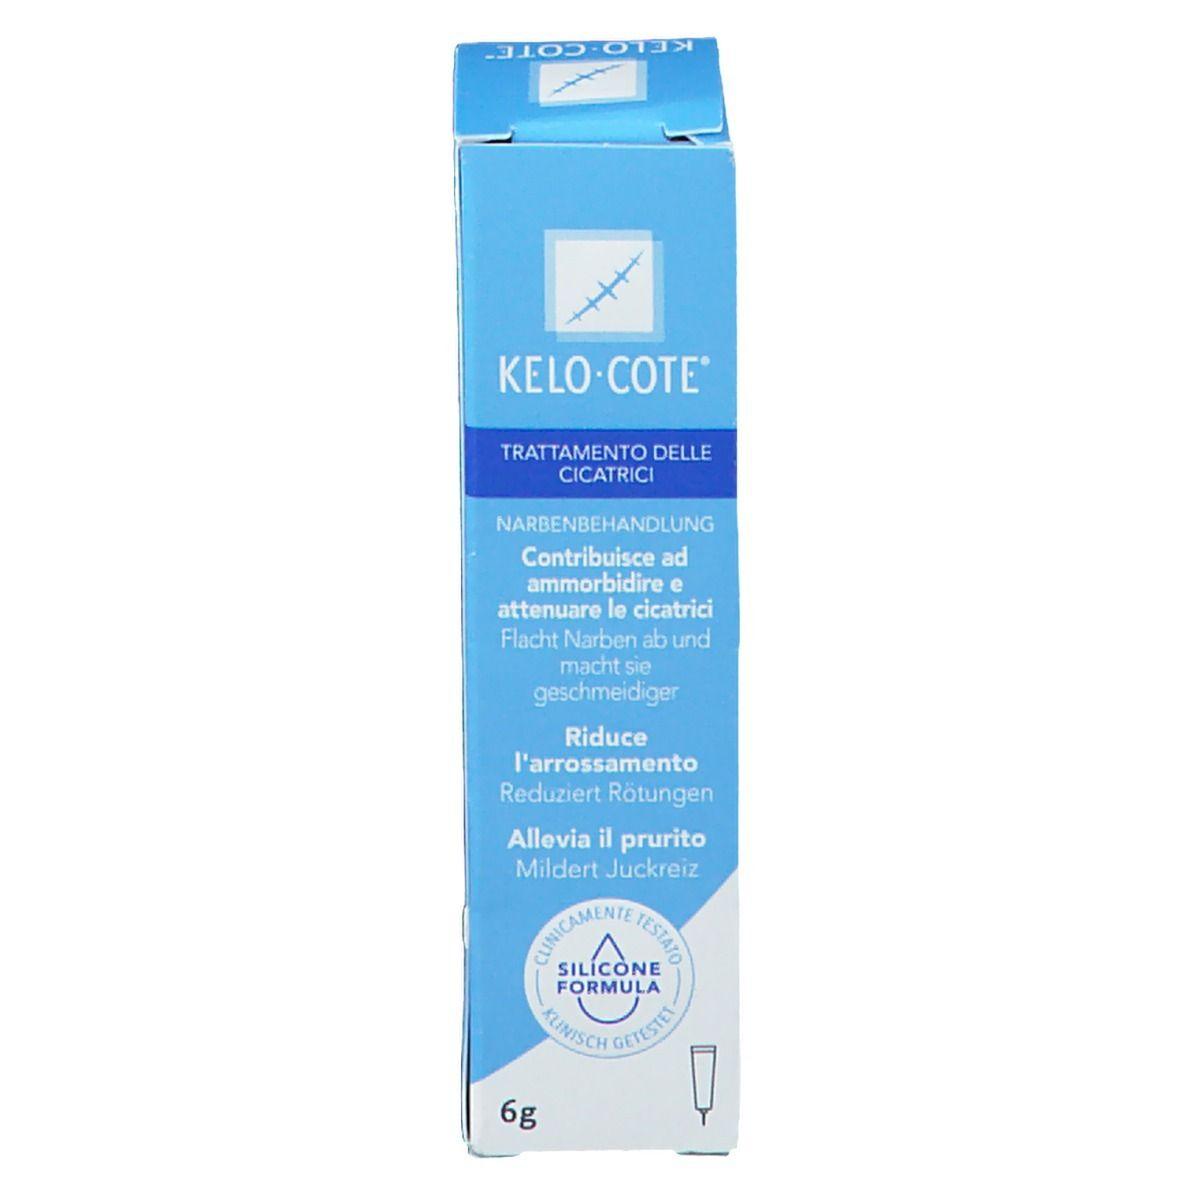 Kelo-cote®